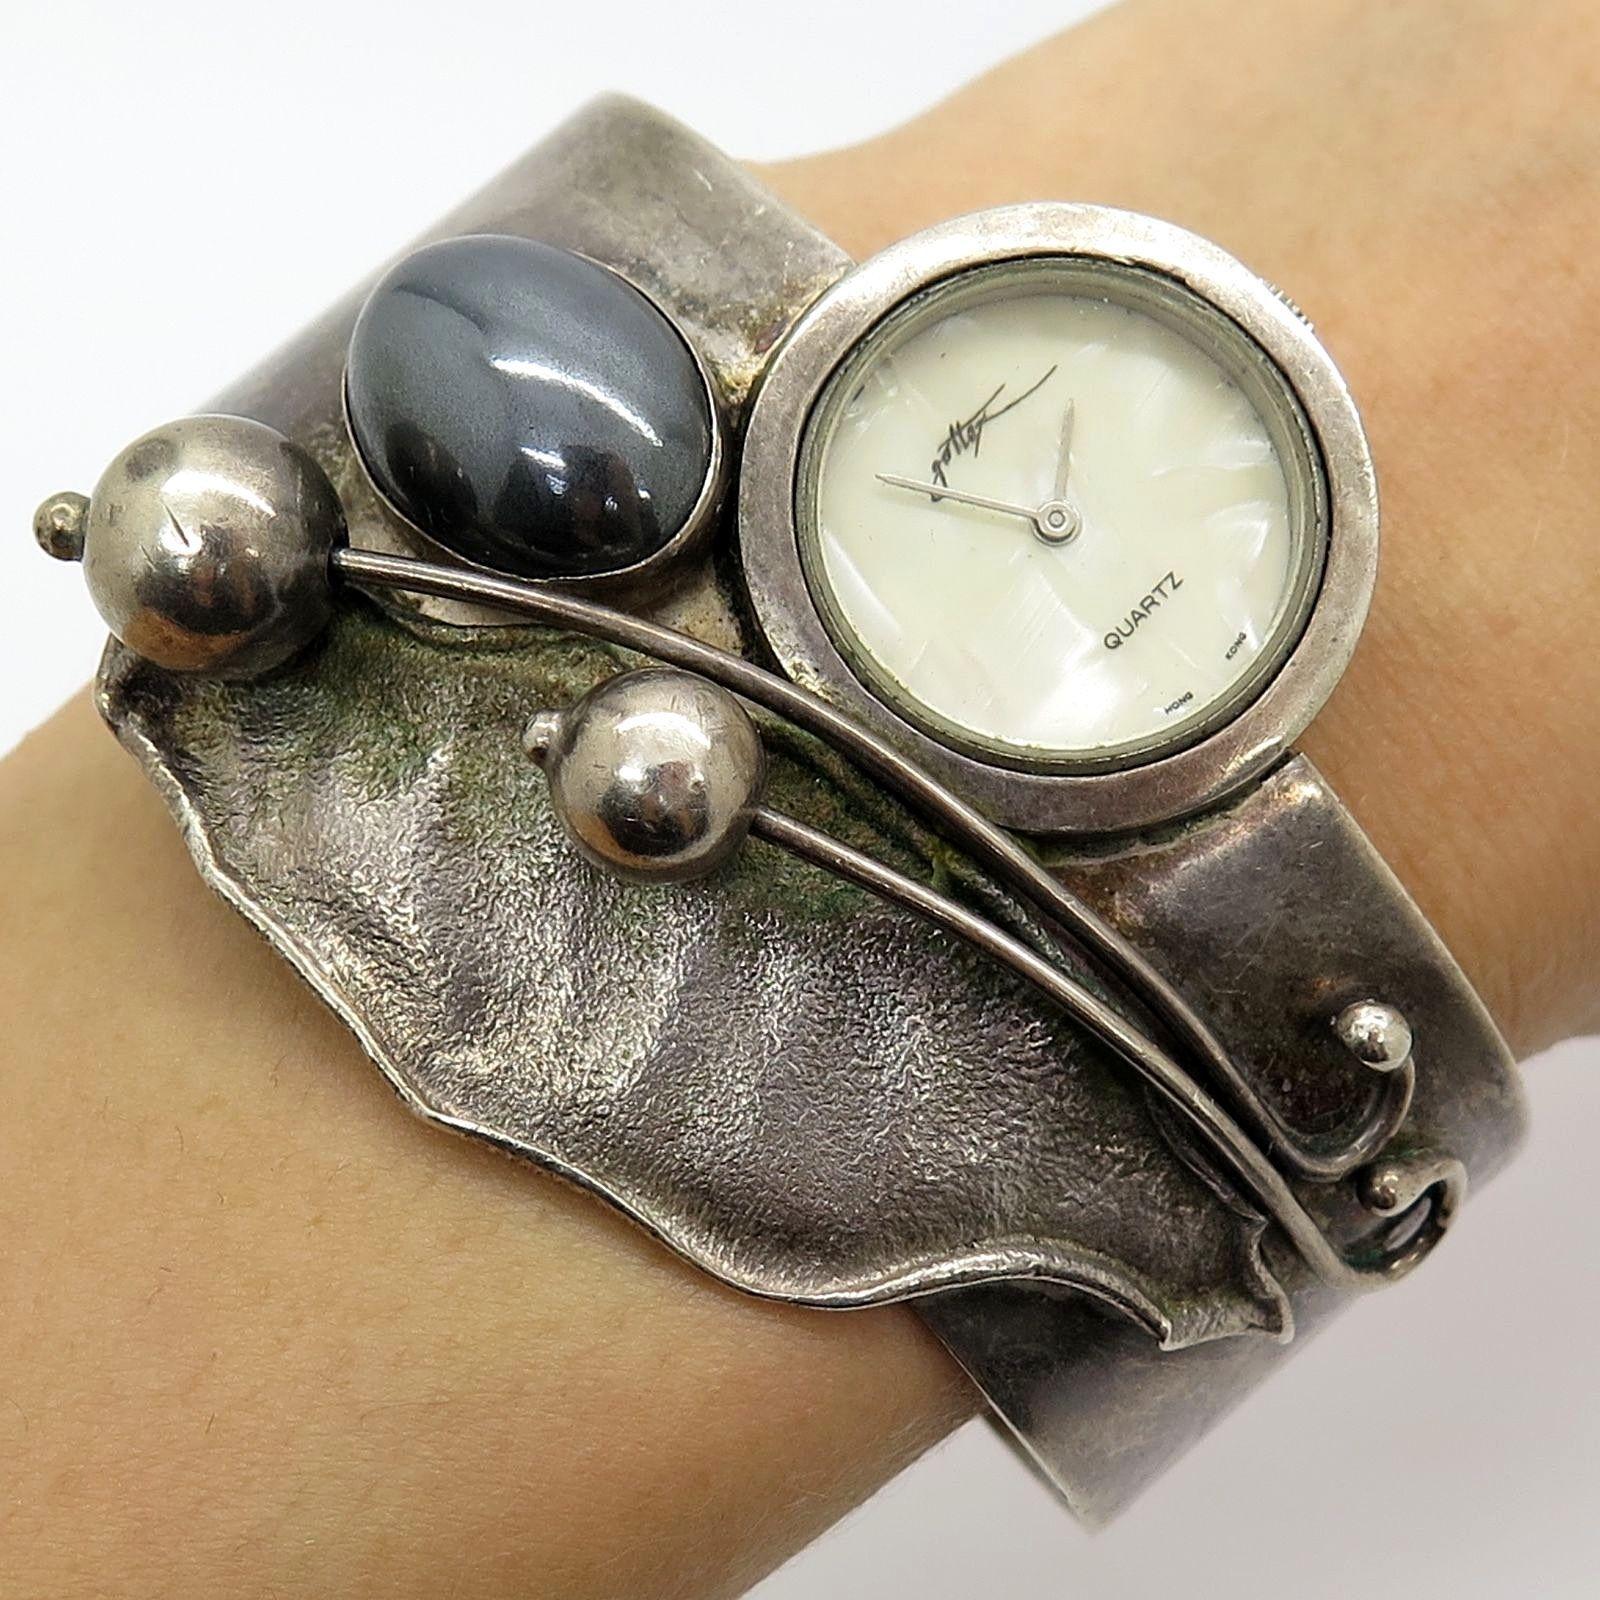 Naoyco Teinxi On Pinterest Mk3278 Rare Avi Soffer Israel Modernist Sterling Silver Art Design Cuff Bracelet Watch Https